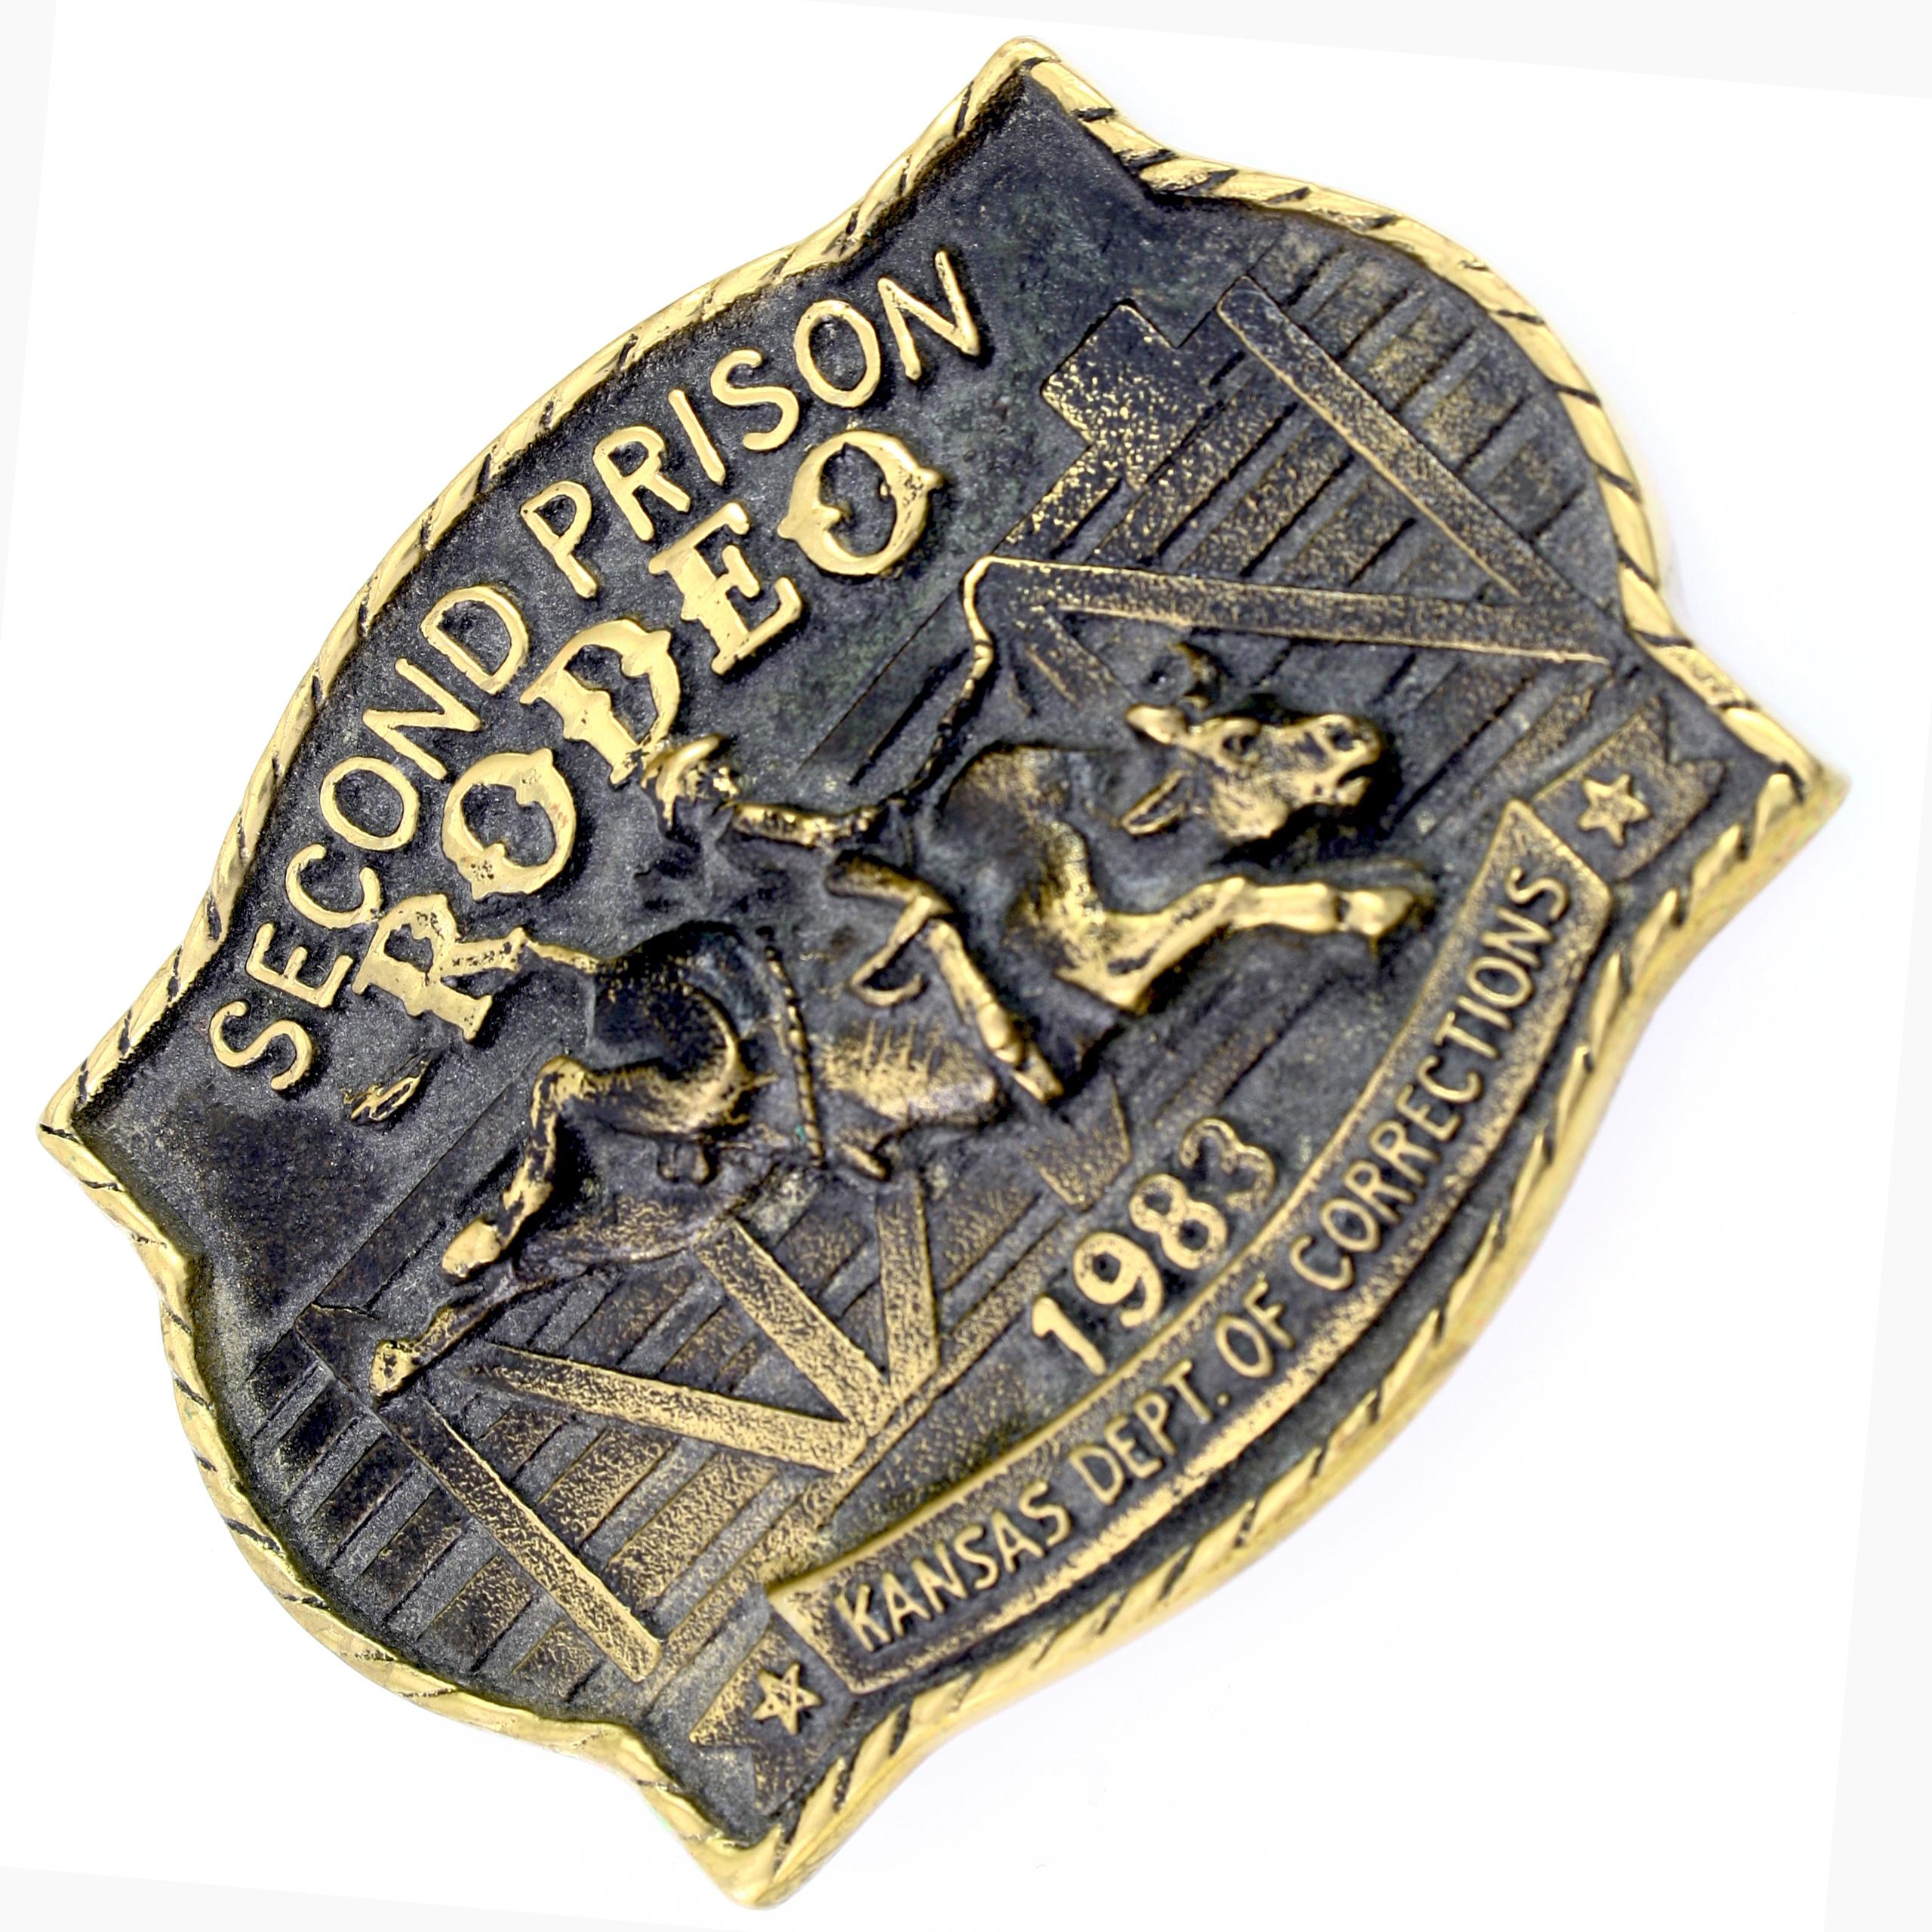 1983 Second Prison Rodeo 1983 Kansas Dept Of